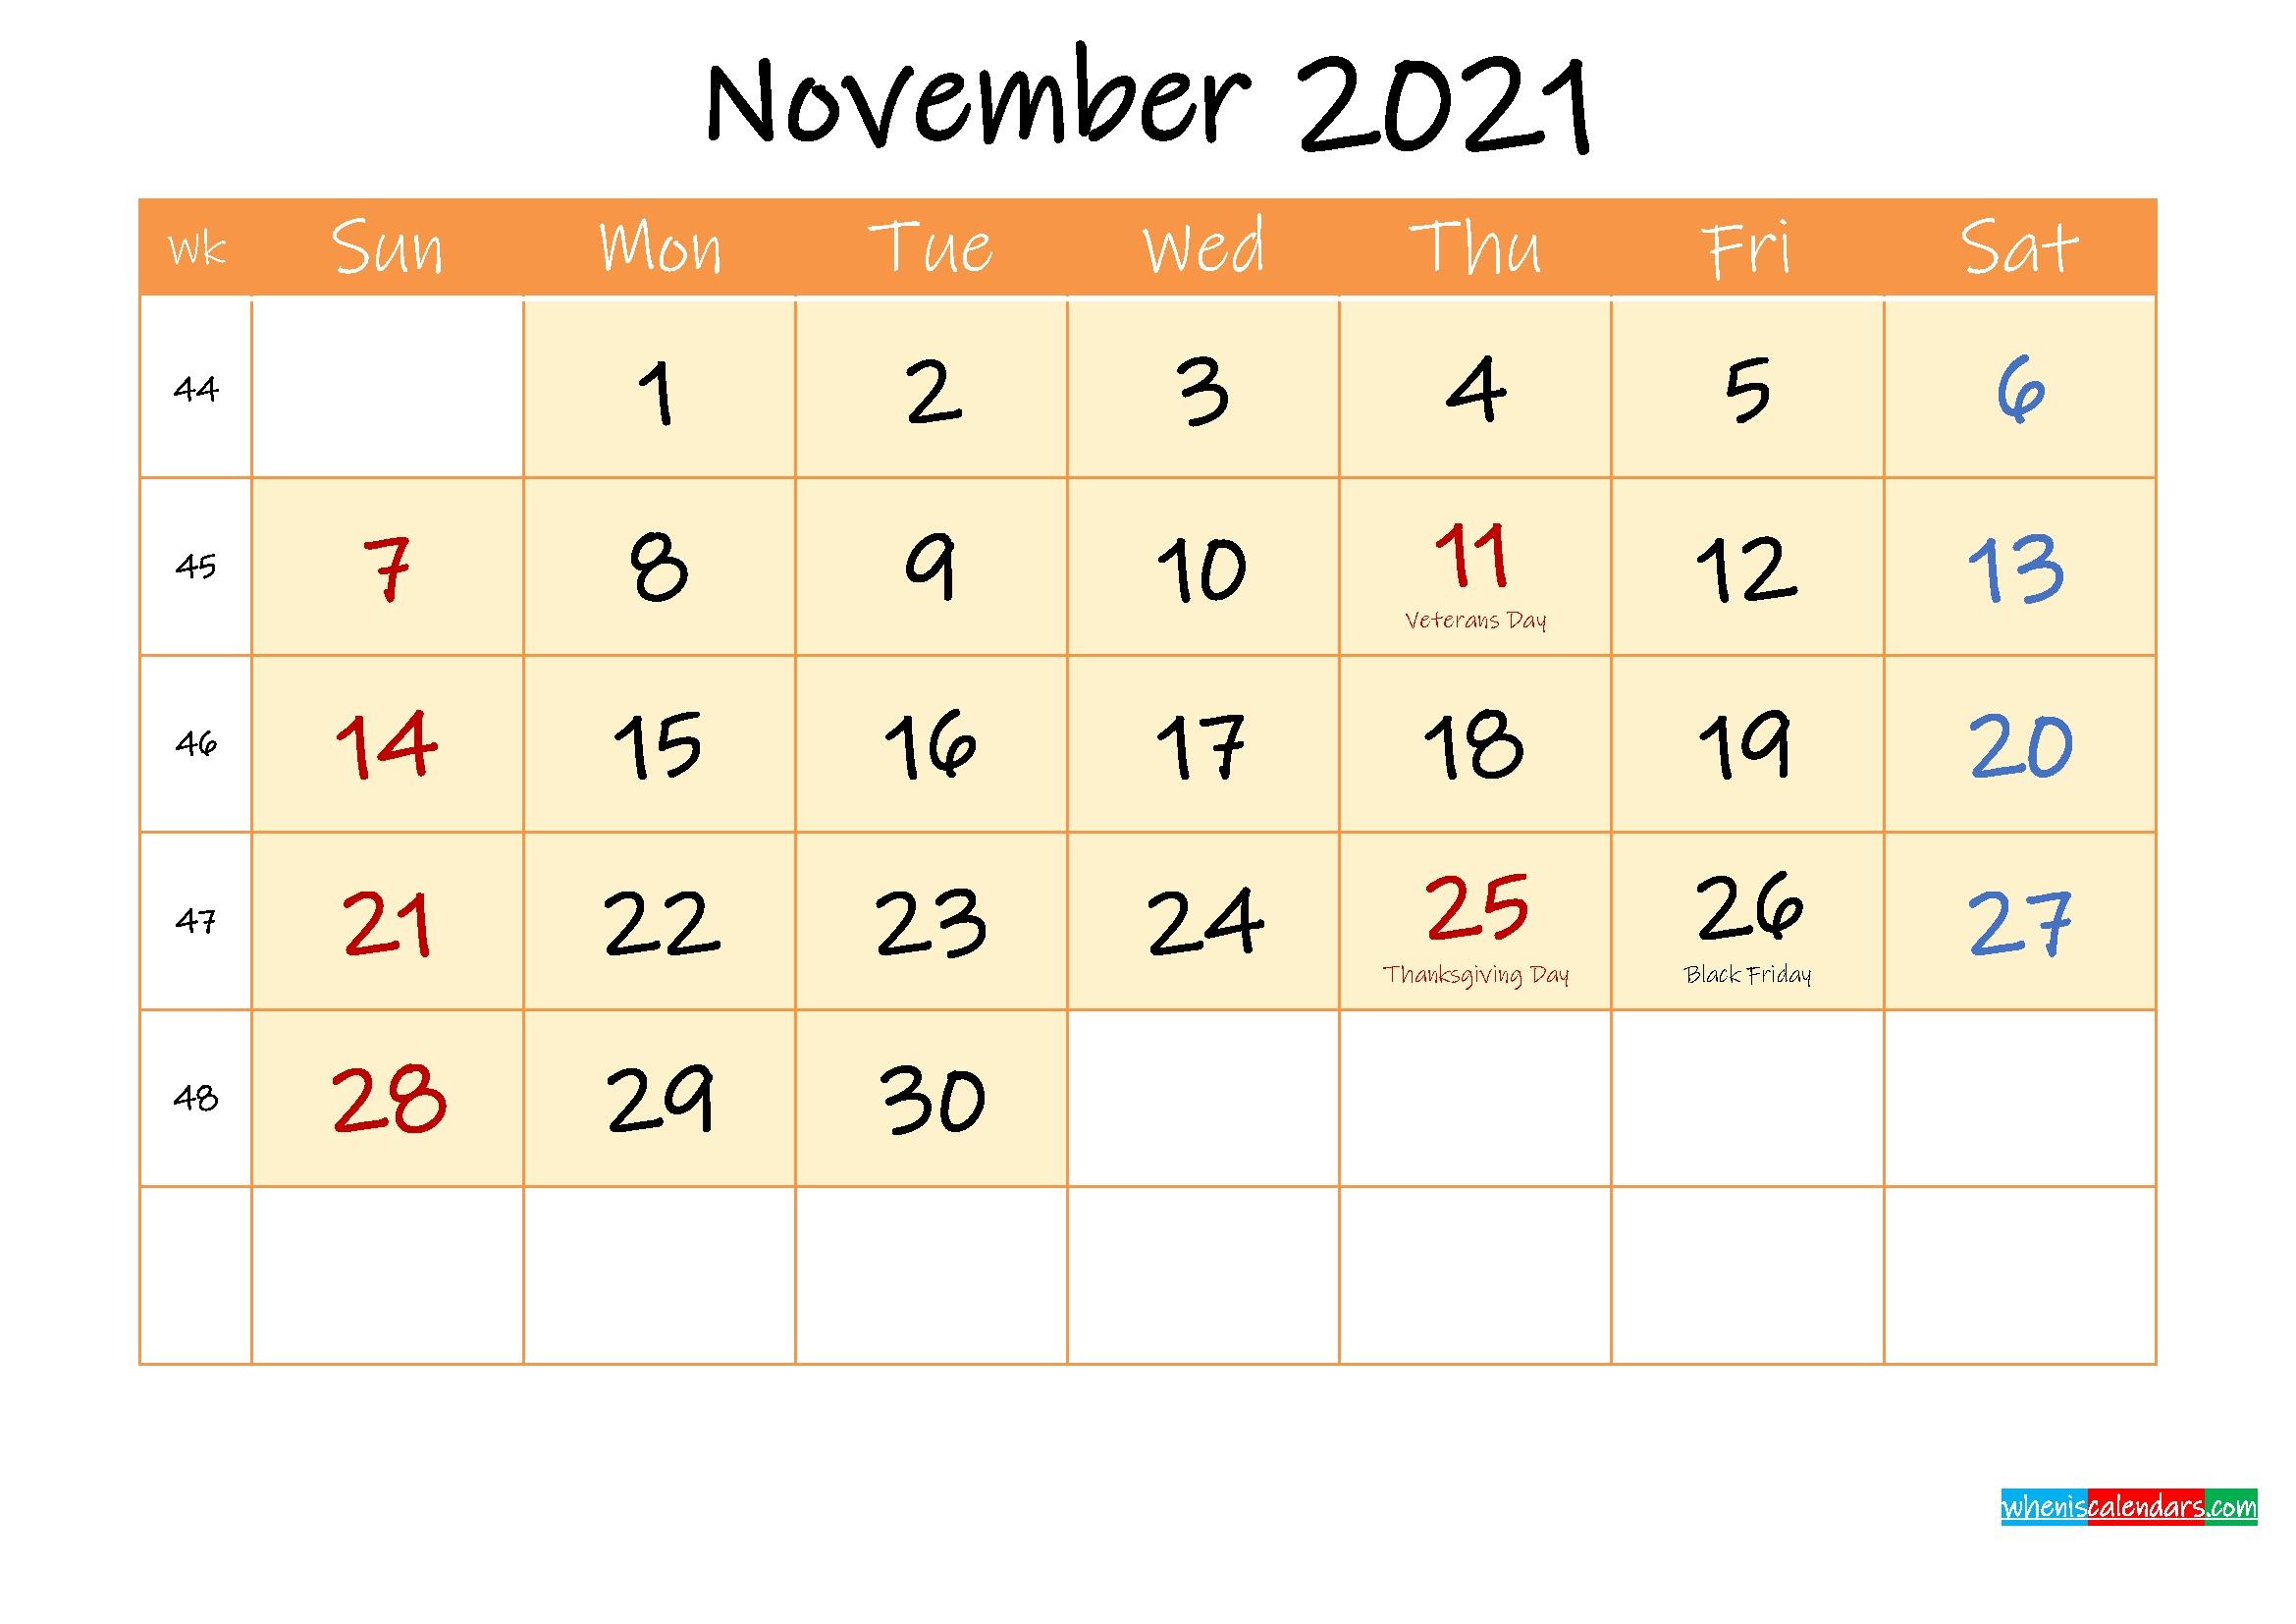 November 2021 Free Printable Calendar - Template Ink21M167 Printable Calendar For November 2021